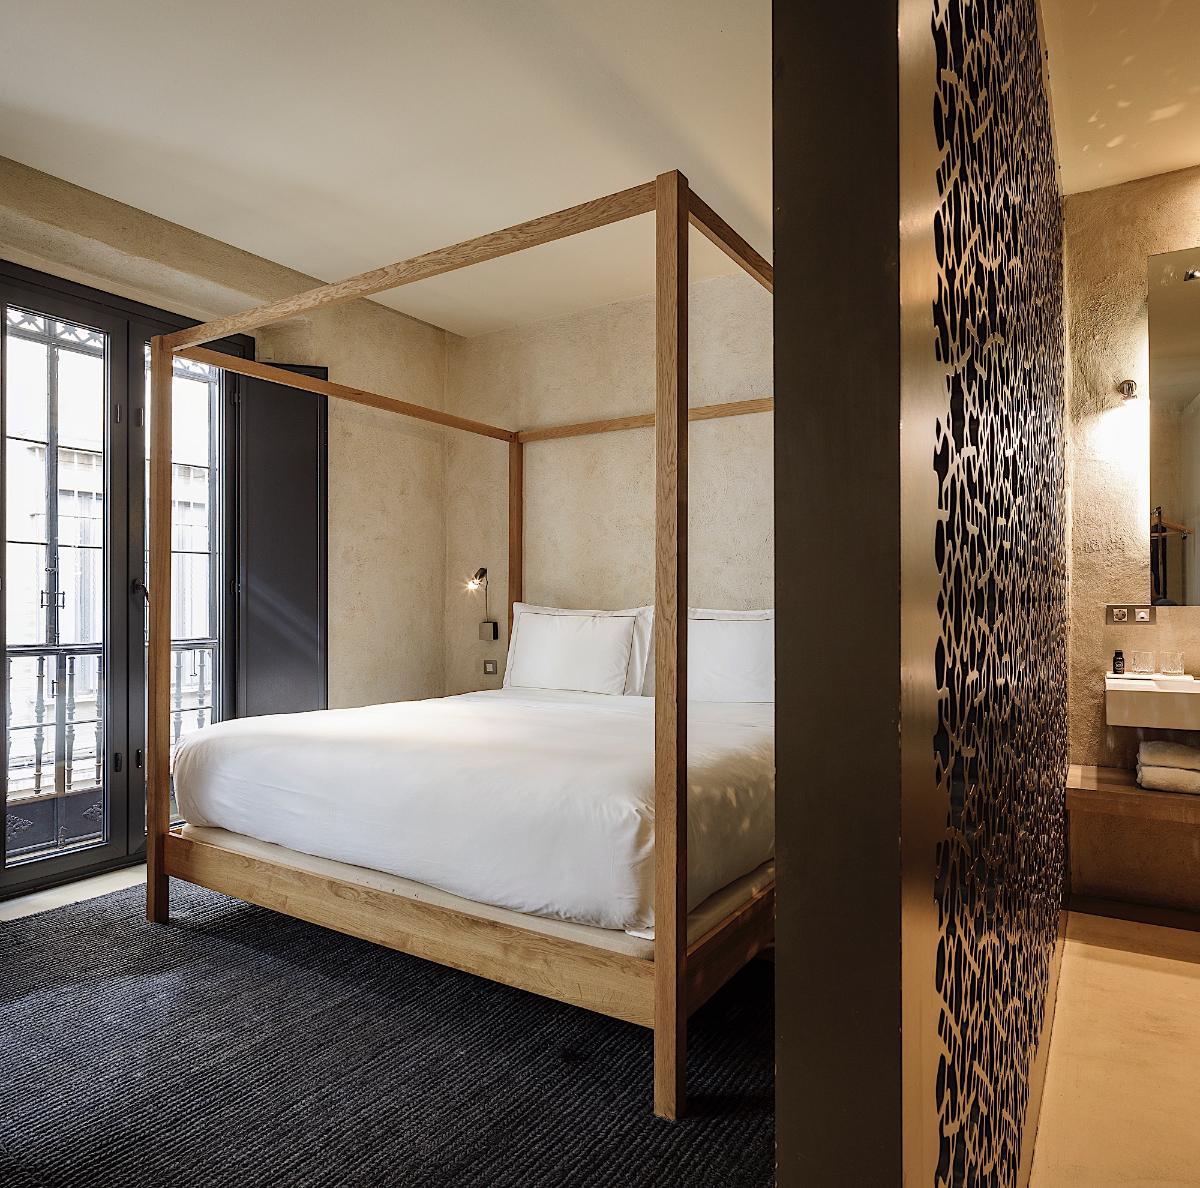 EME Catedral Mercer Hotel Gran Deluxe Room